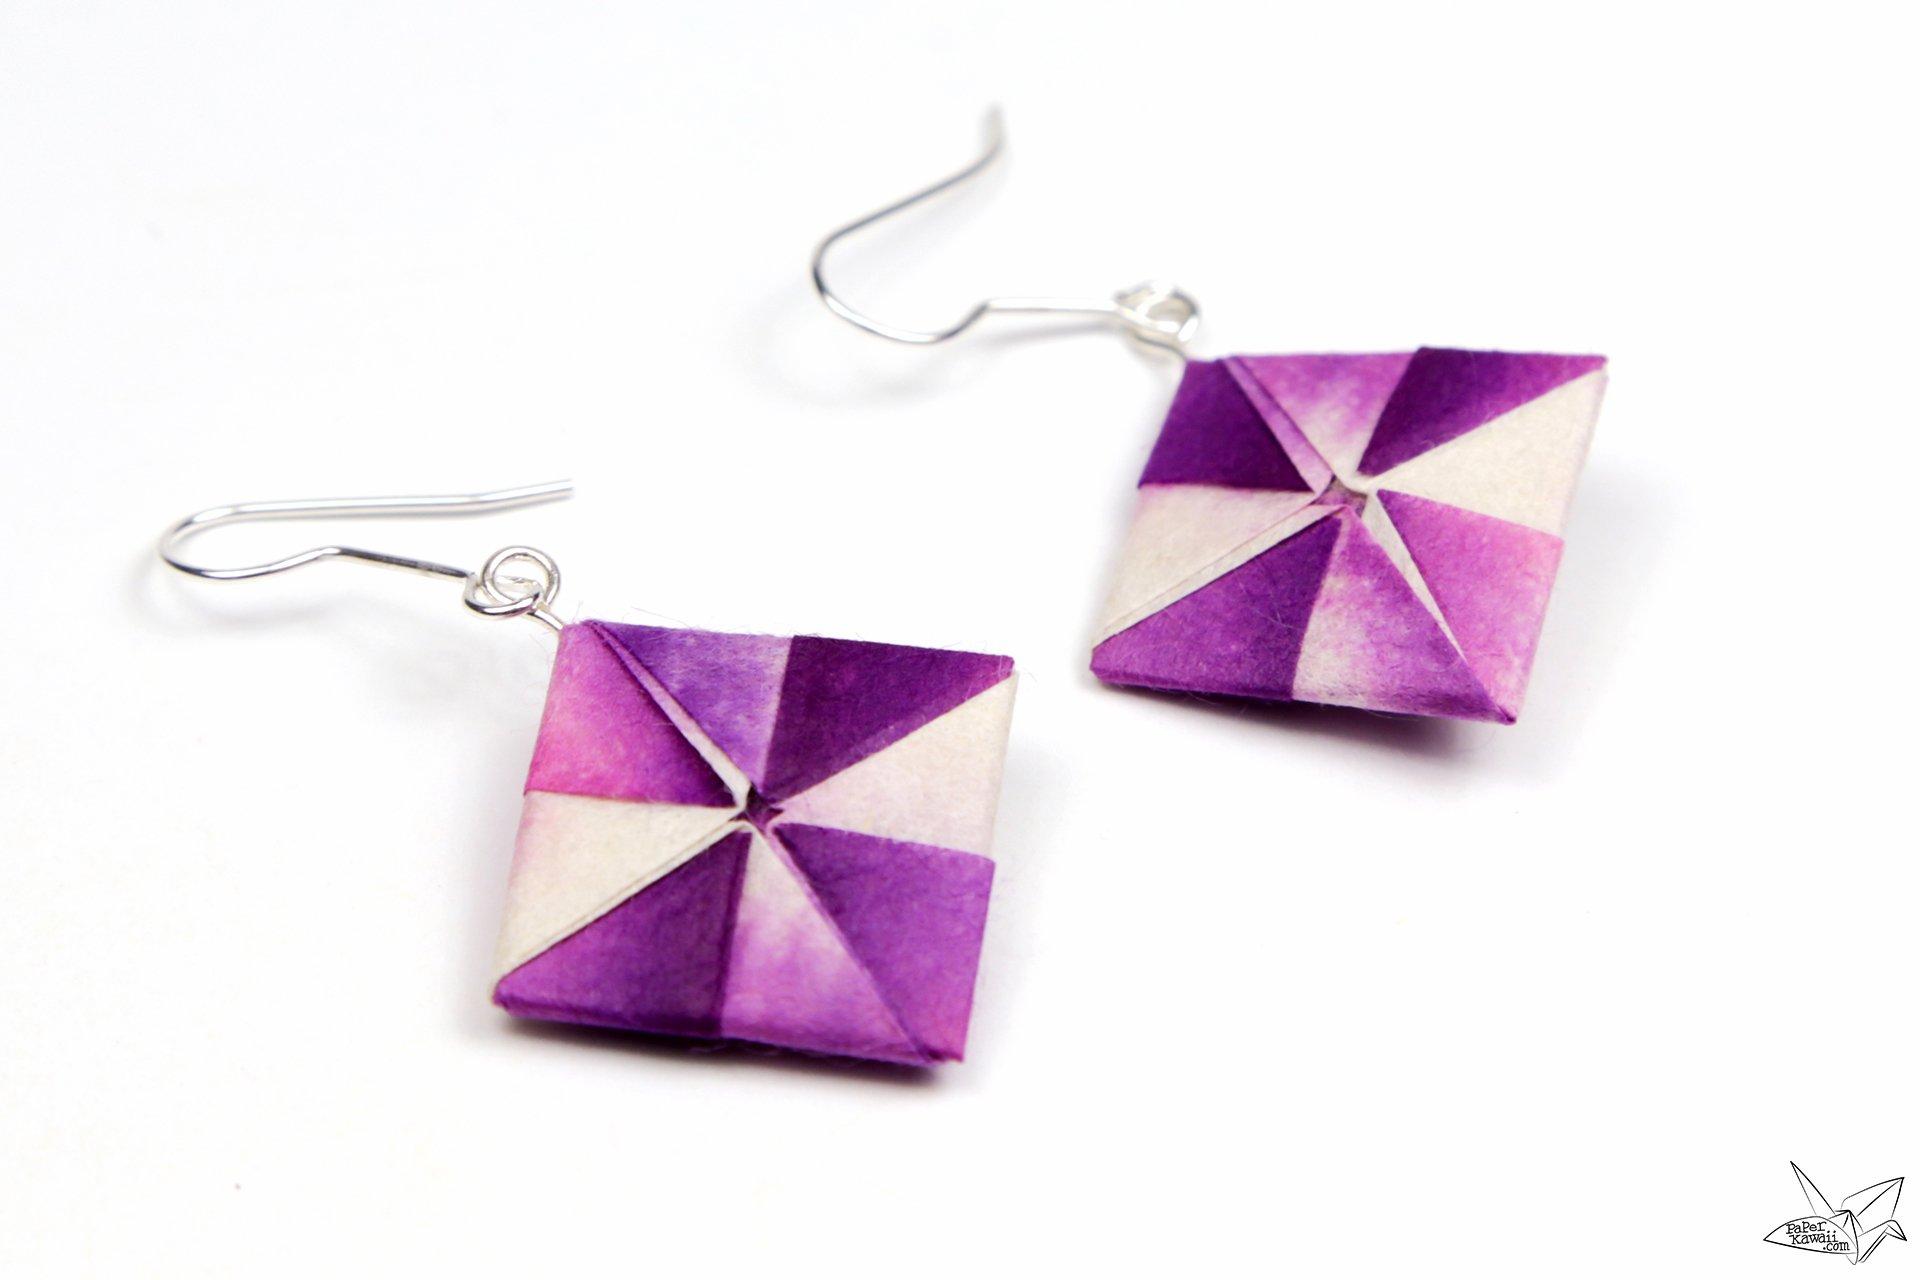 Origami Earrings Tutorial - Pinwheel Squares via @paper_kawaii